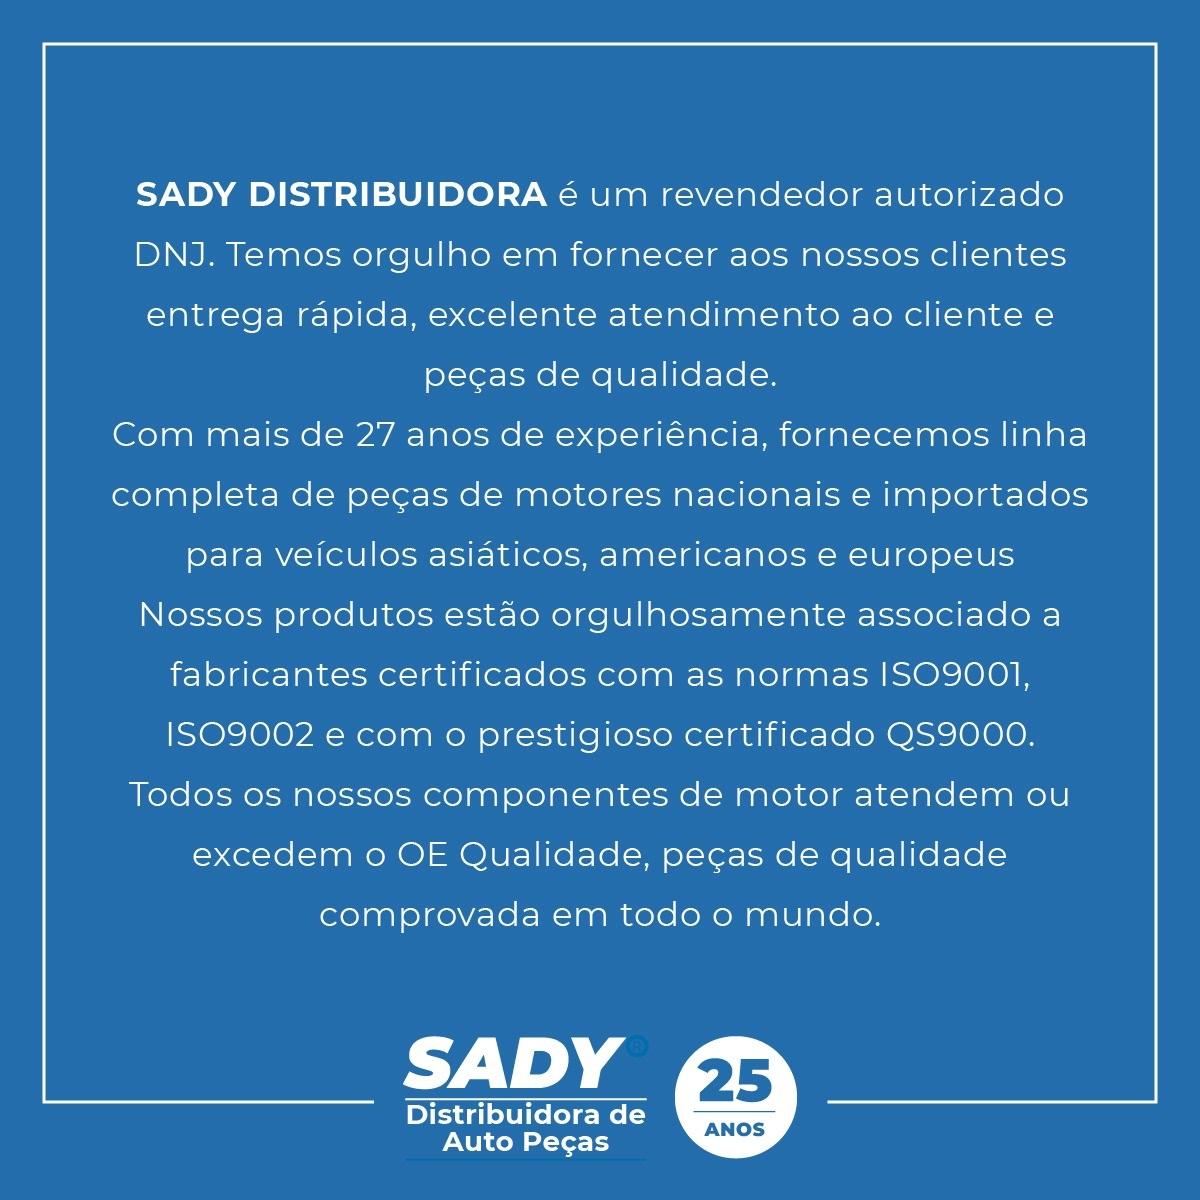 BOMBA DE OLEO DO MOTOR TOYOTA 2.2 8V EMP 4Y